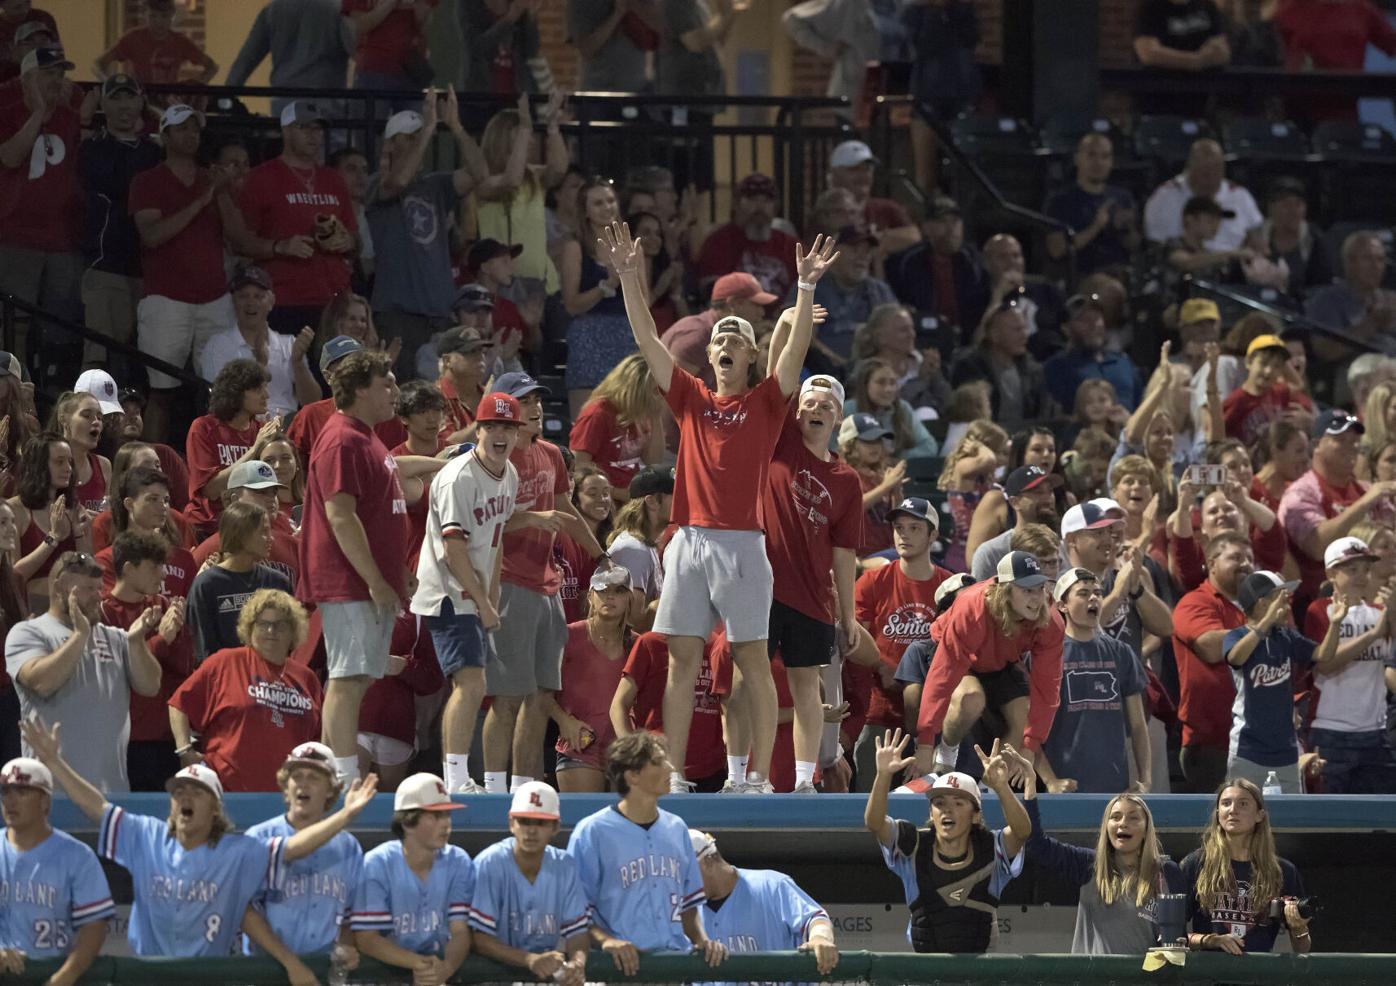 Manheim Central vs. Red Land- PIAA 5A baseball semifinal